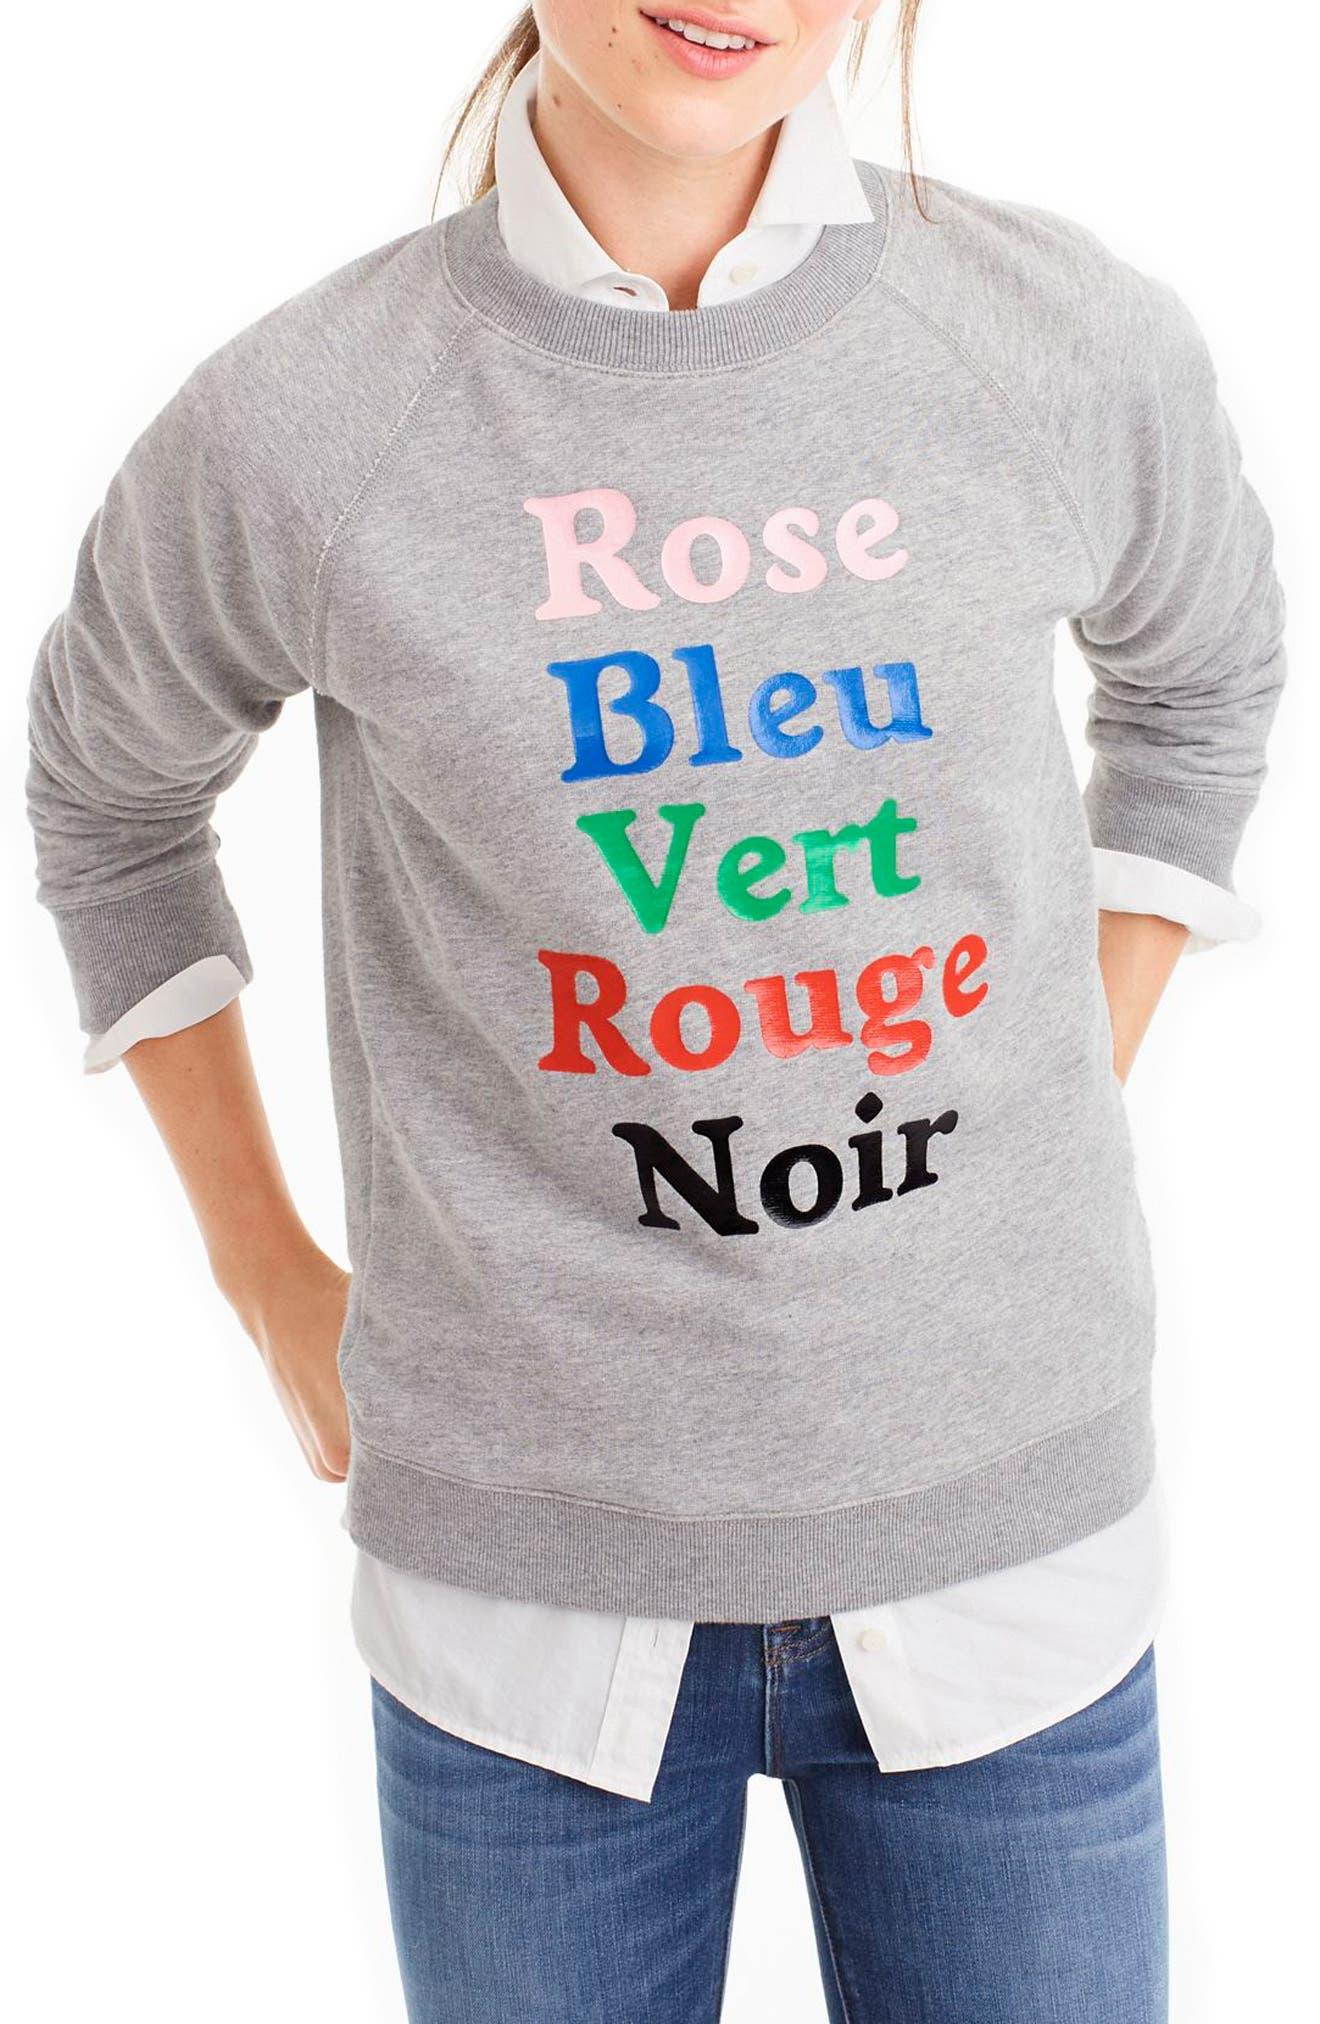 French Colors Sweatshirt,                             Main thumbnail 1, color,                             Heather Grey